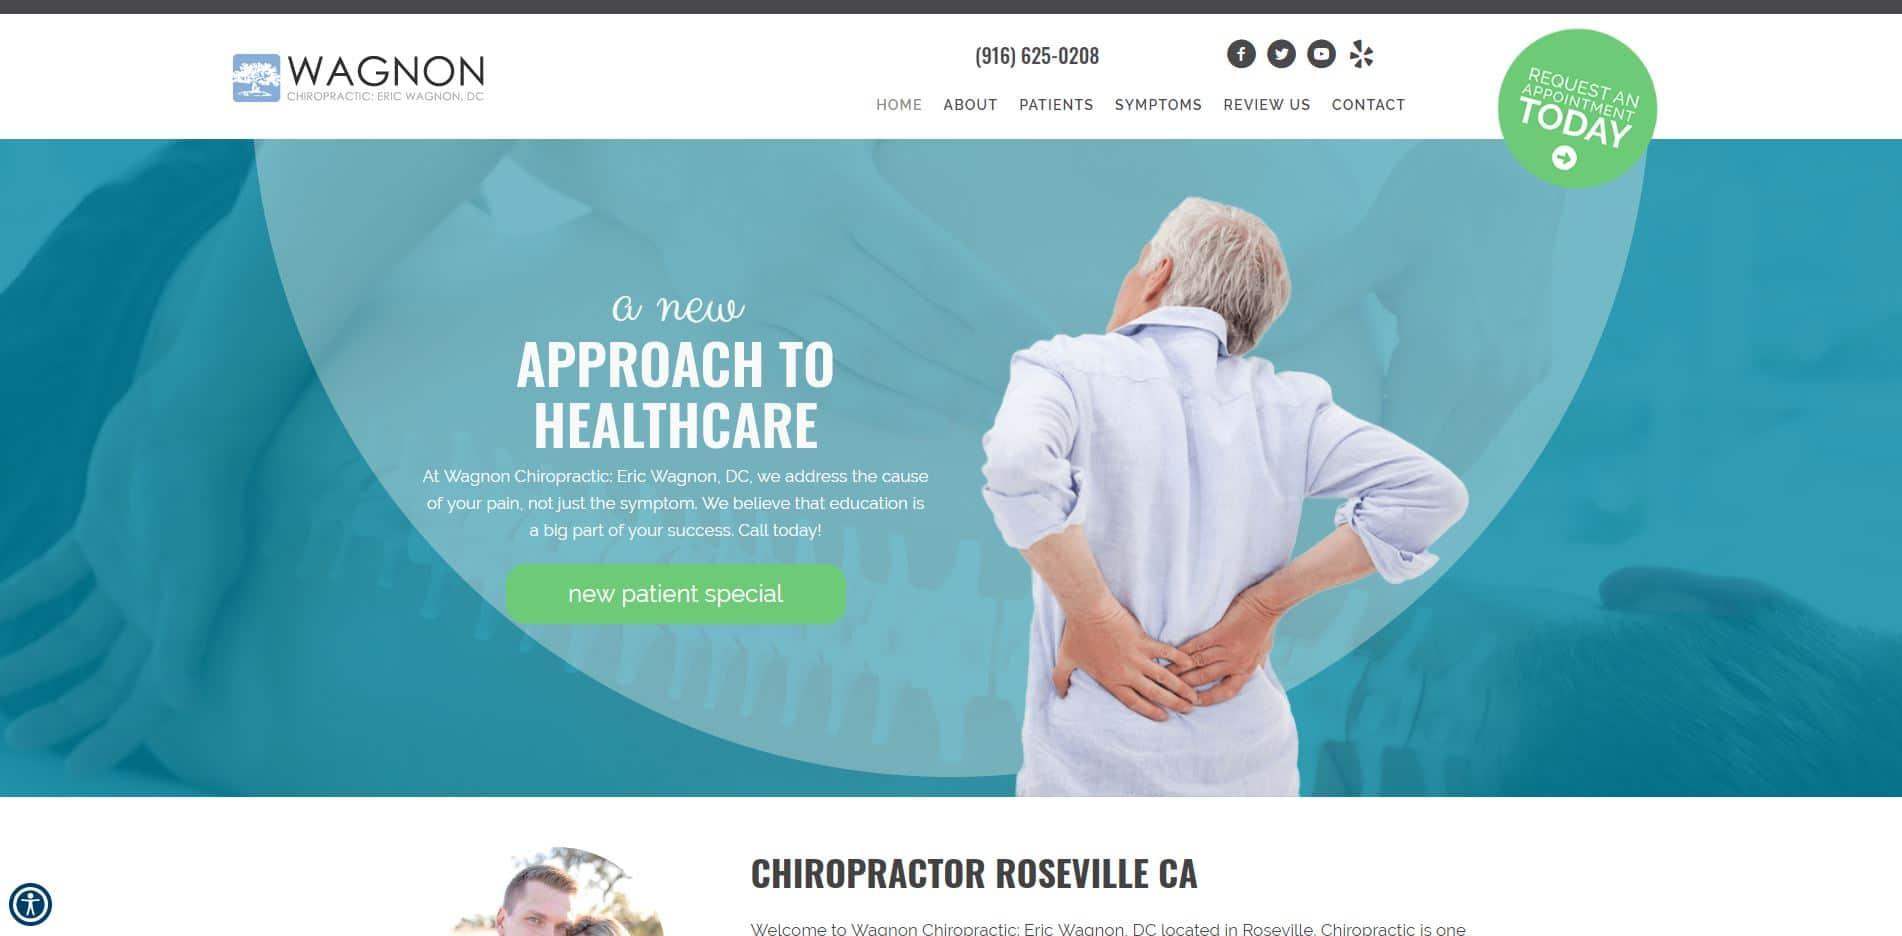 Chiropractor in Roseville